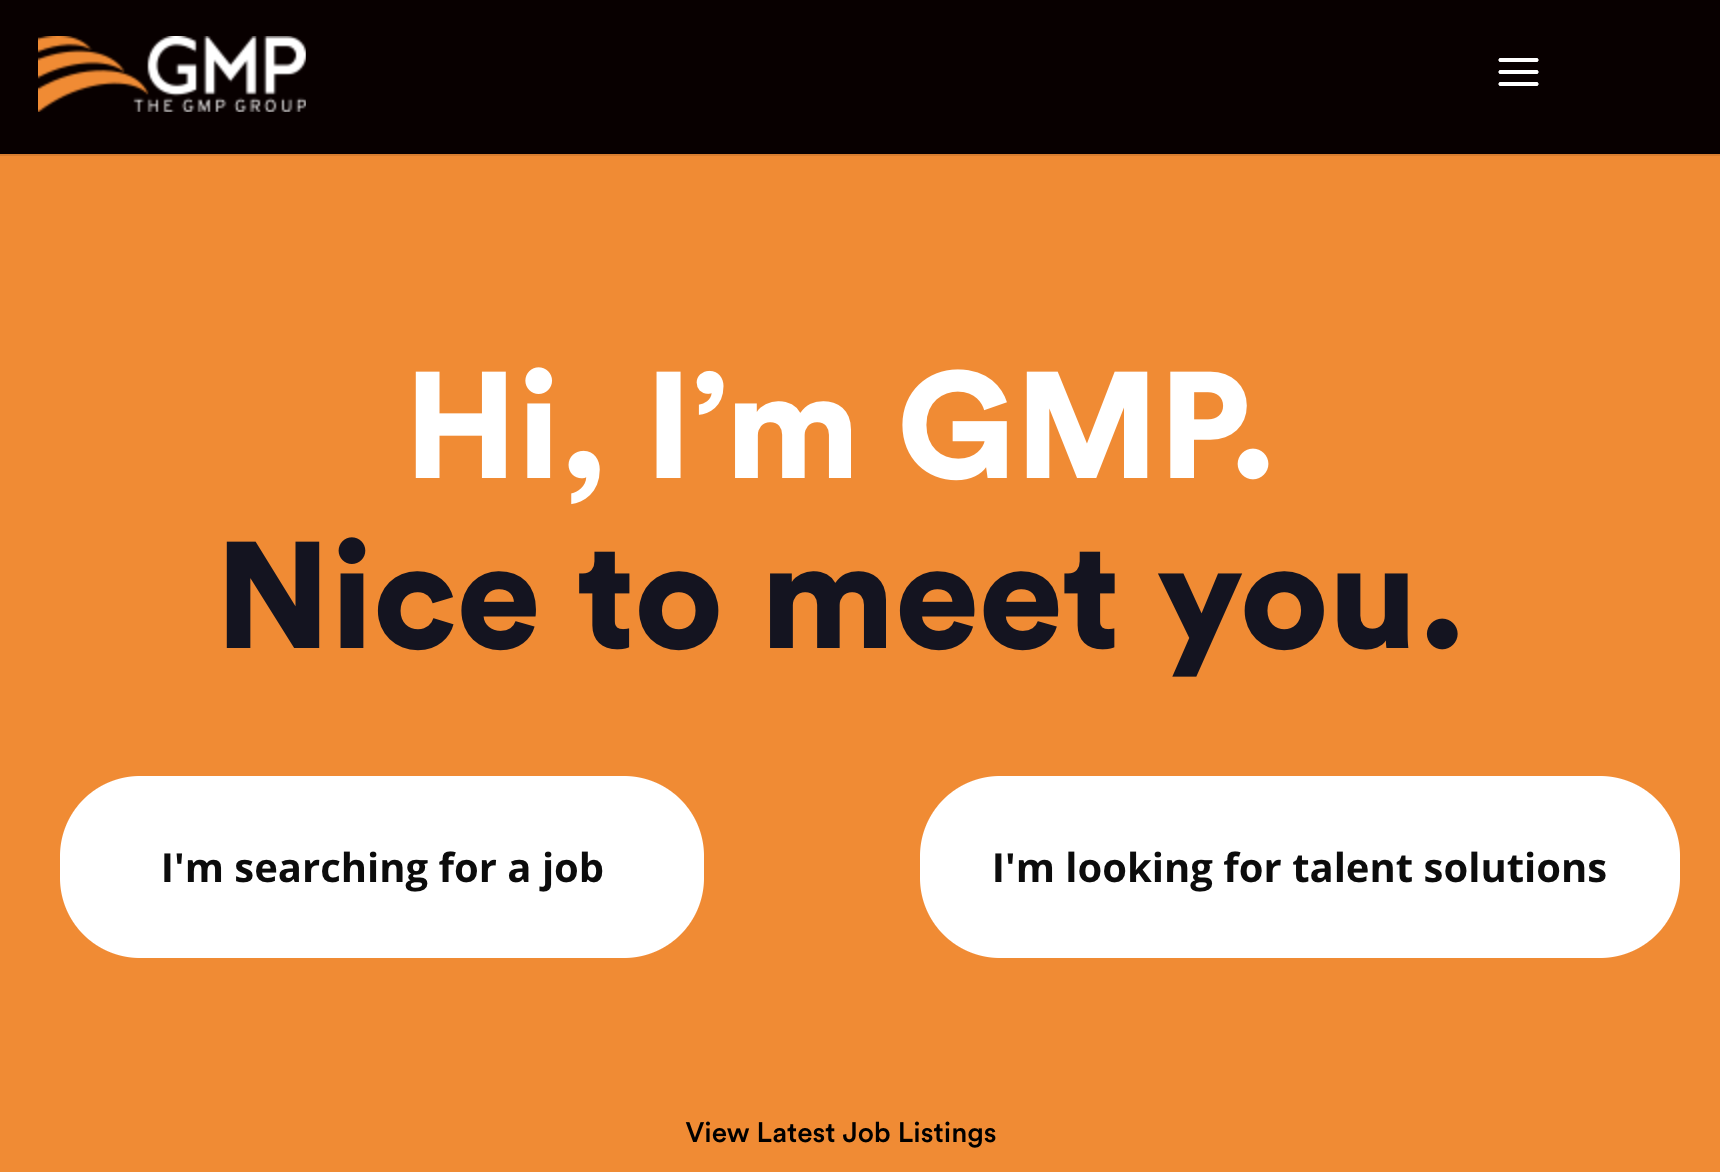 gmp group job agencies singapore